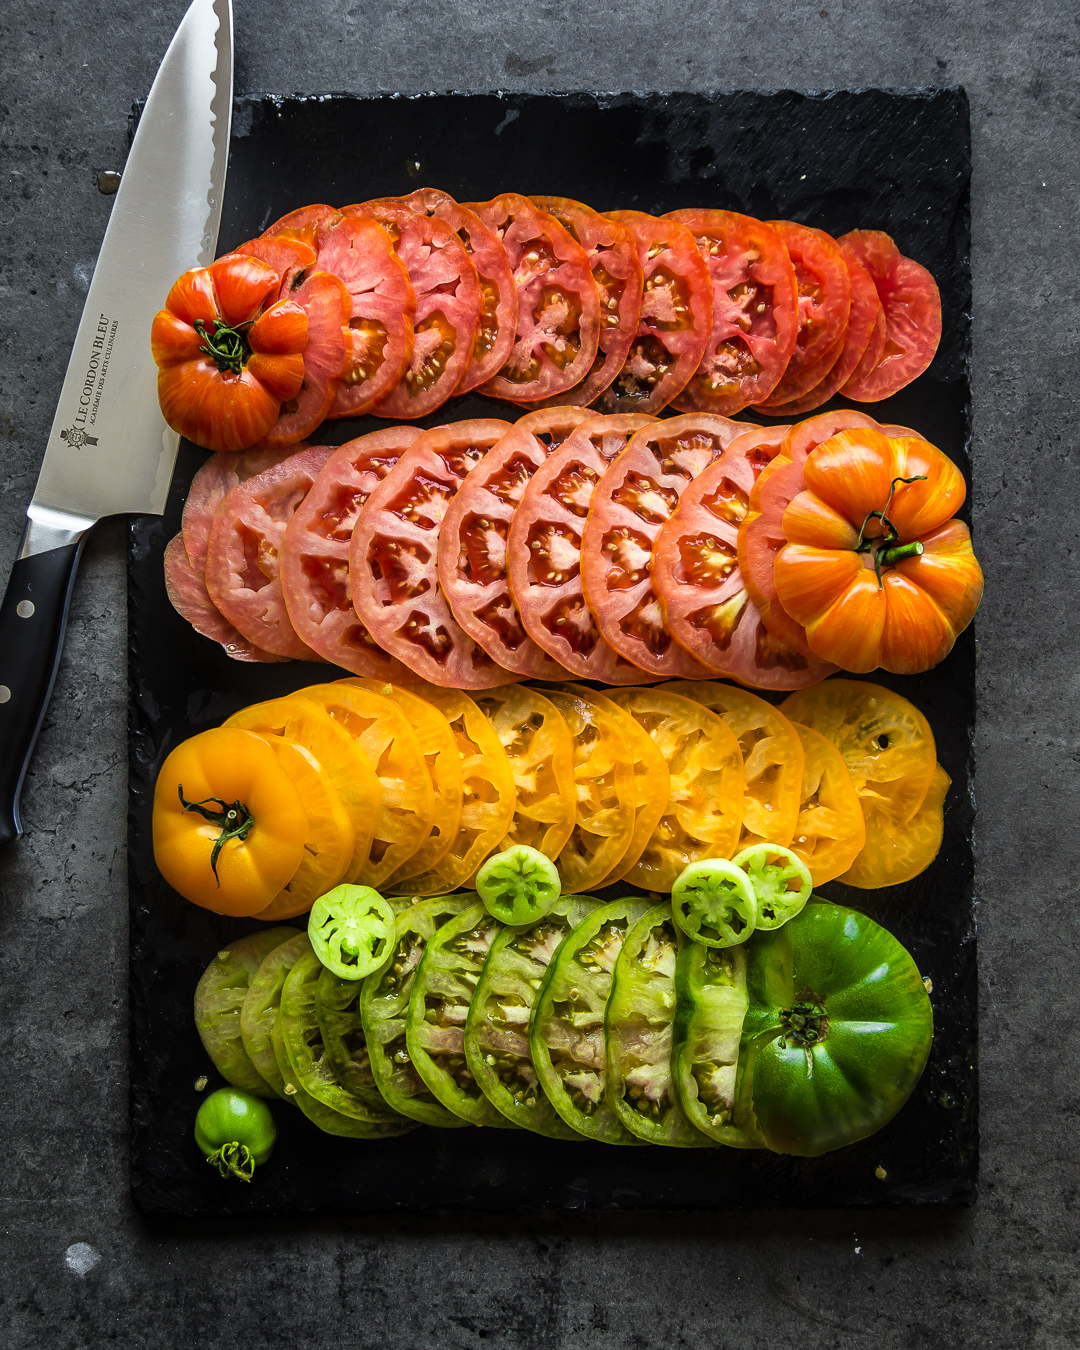 Zwilling Diplome Cordon Bleu Chef Knife Giveaway Primal Gourmet